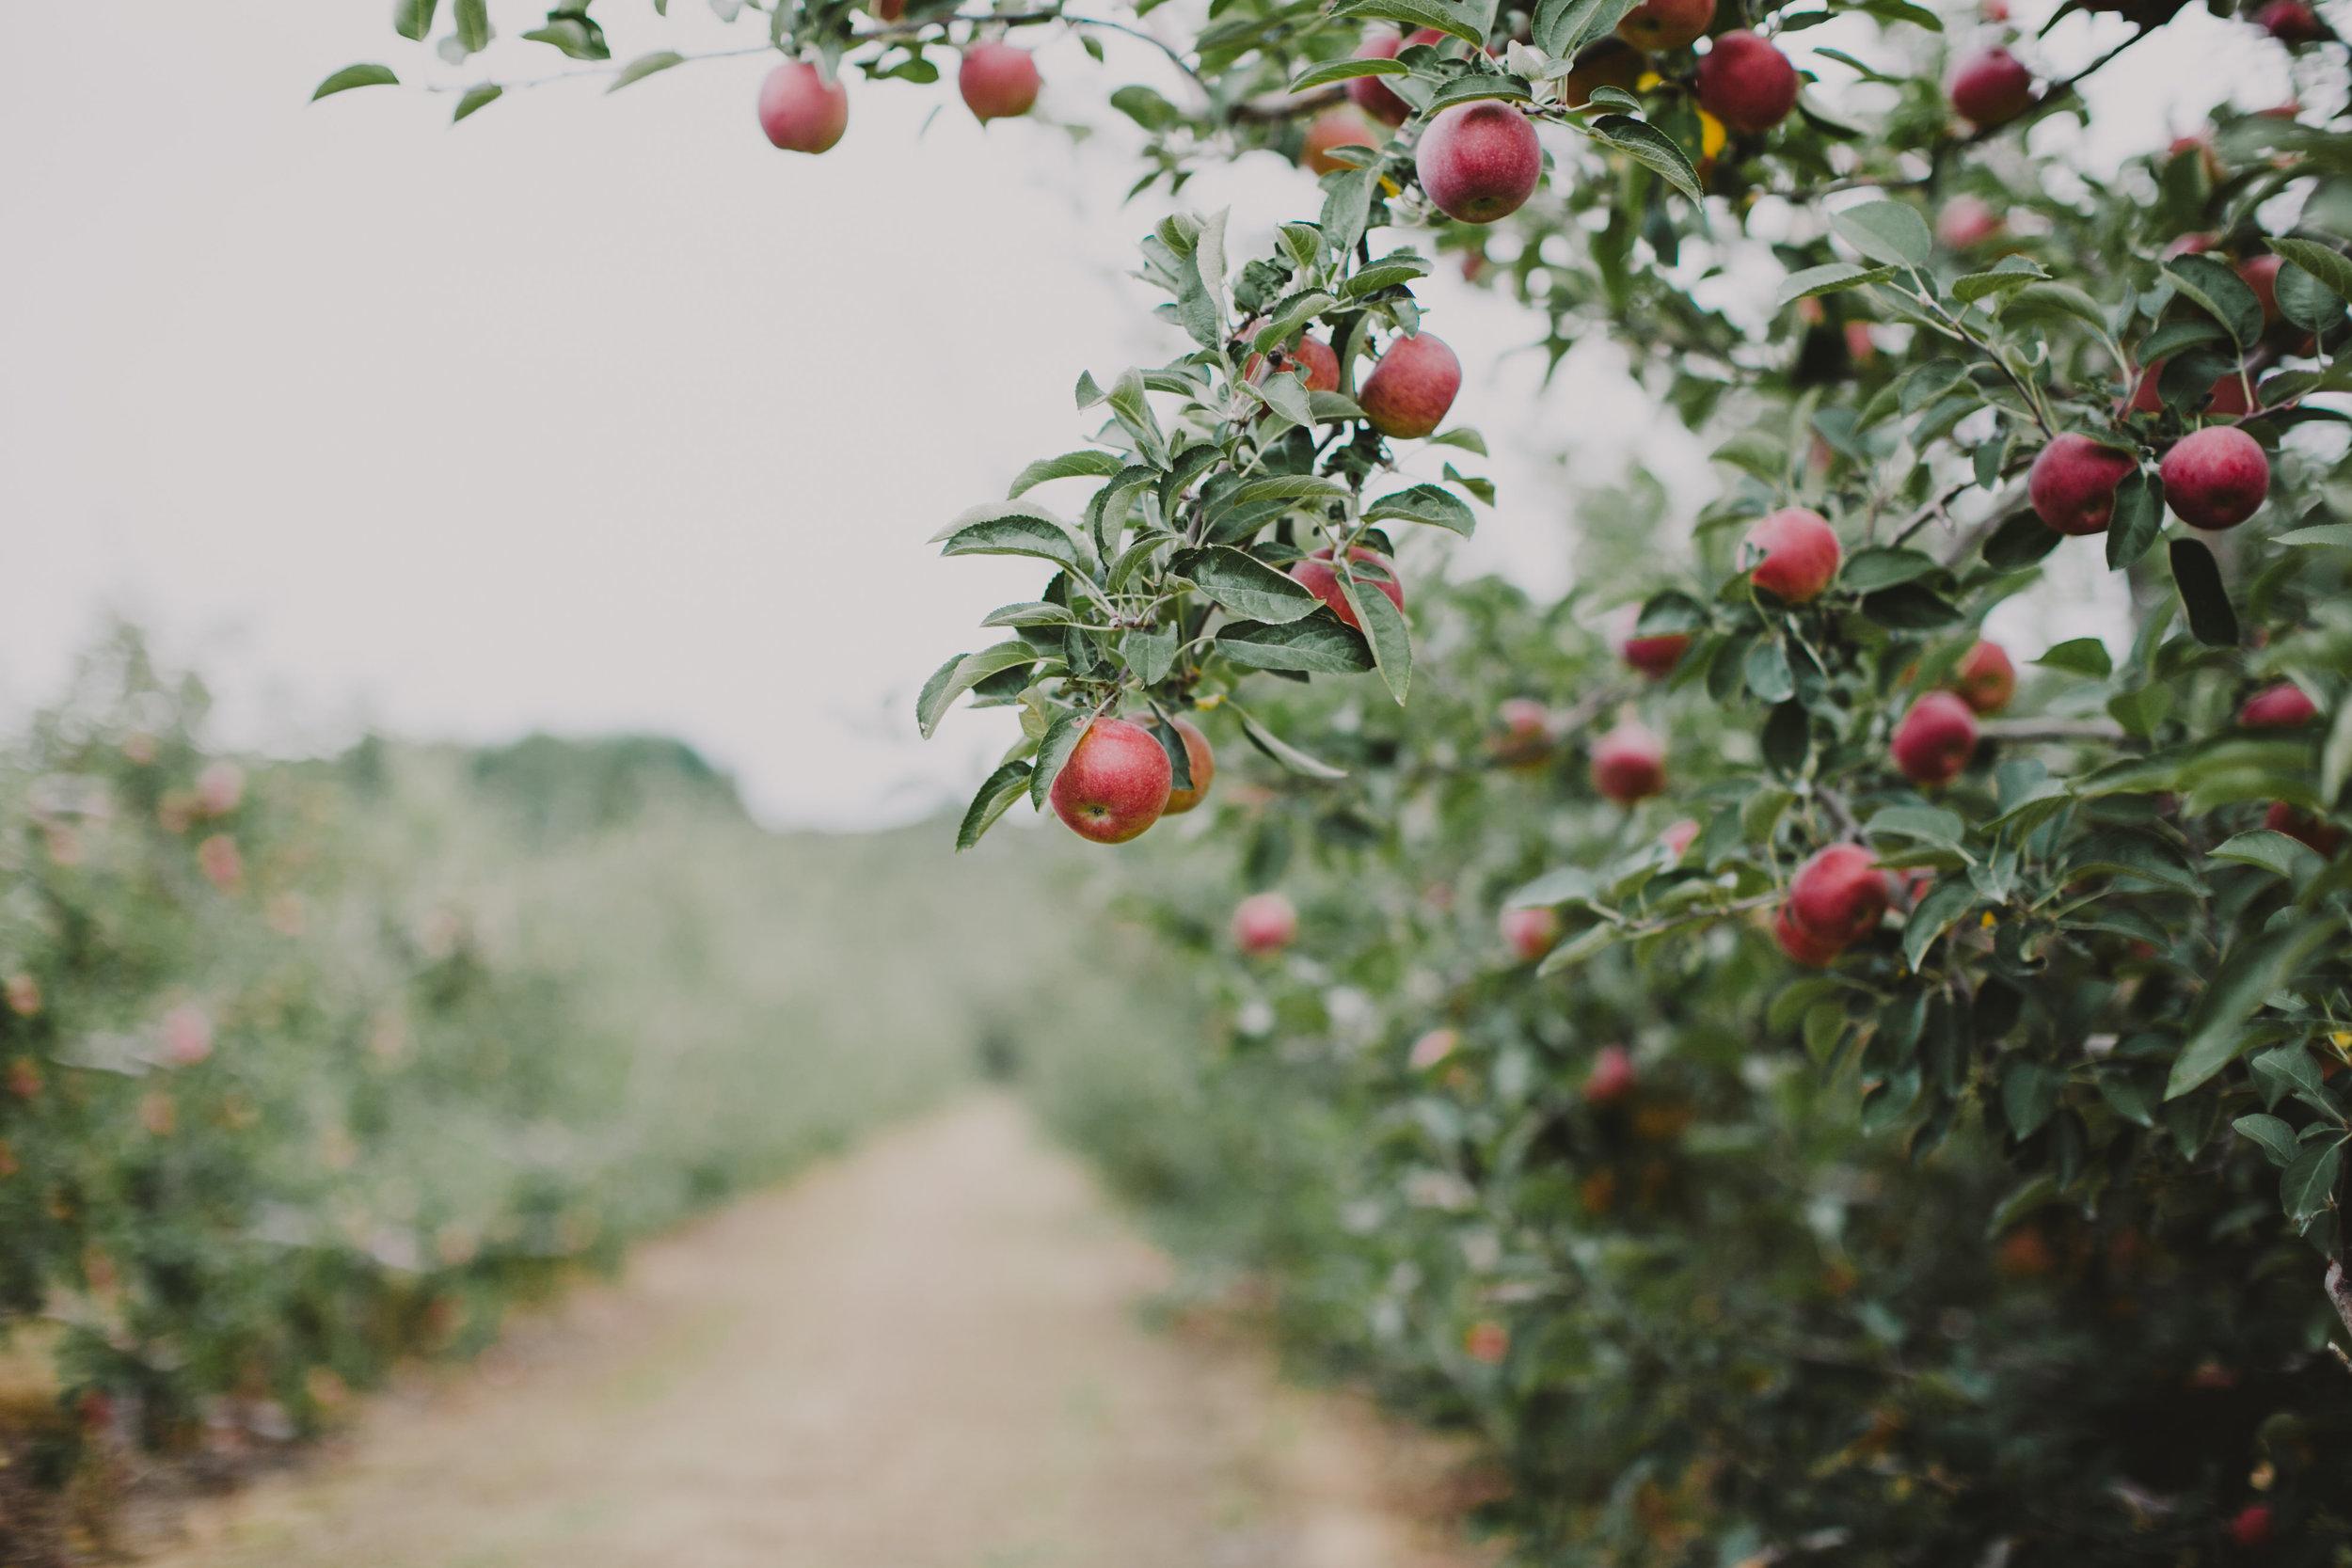 LIBERTY_VIEW_FARM_HIGHLAND_NY_WEDDING_CHELLISE_MICHAEL_PHOTOGRAPHY725.JPG